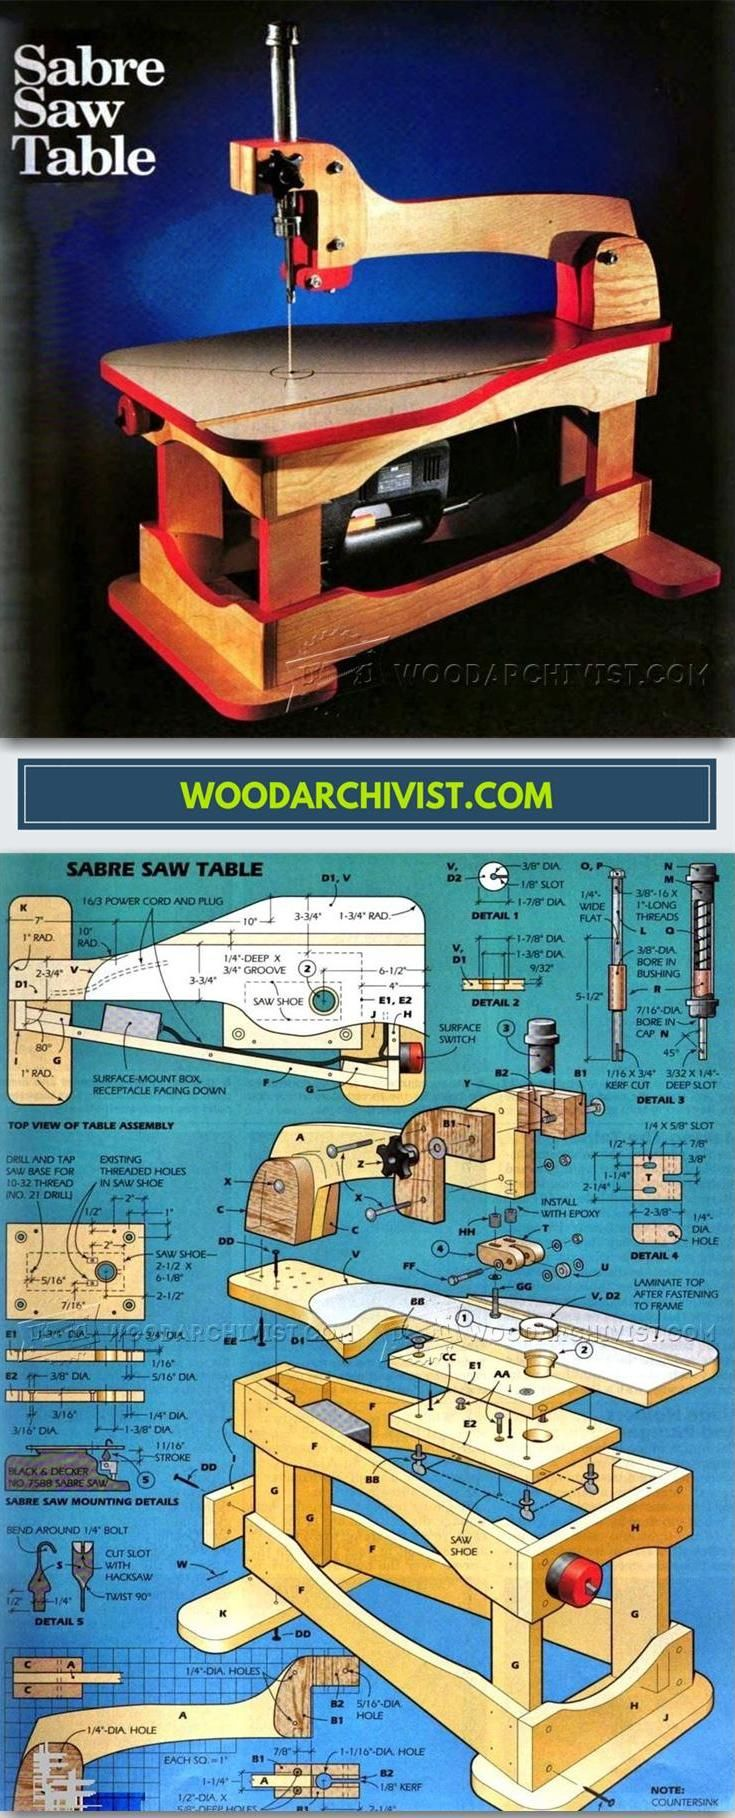 DIY Scroll Saw - Scroll Saw Tips, Jigs and Fixtures | WoodArchivist.com